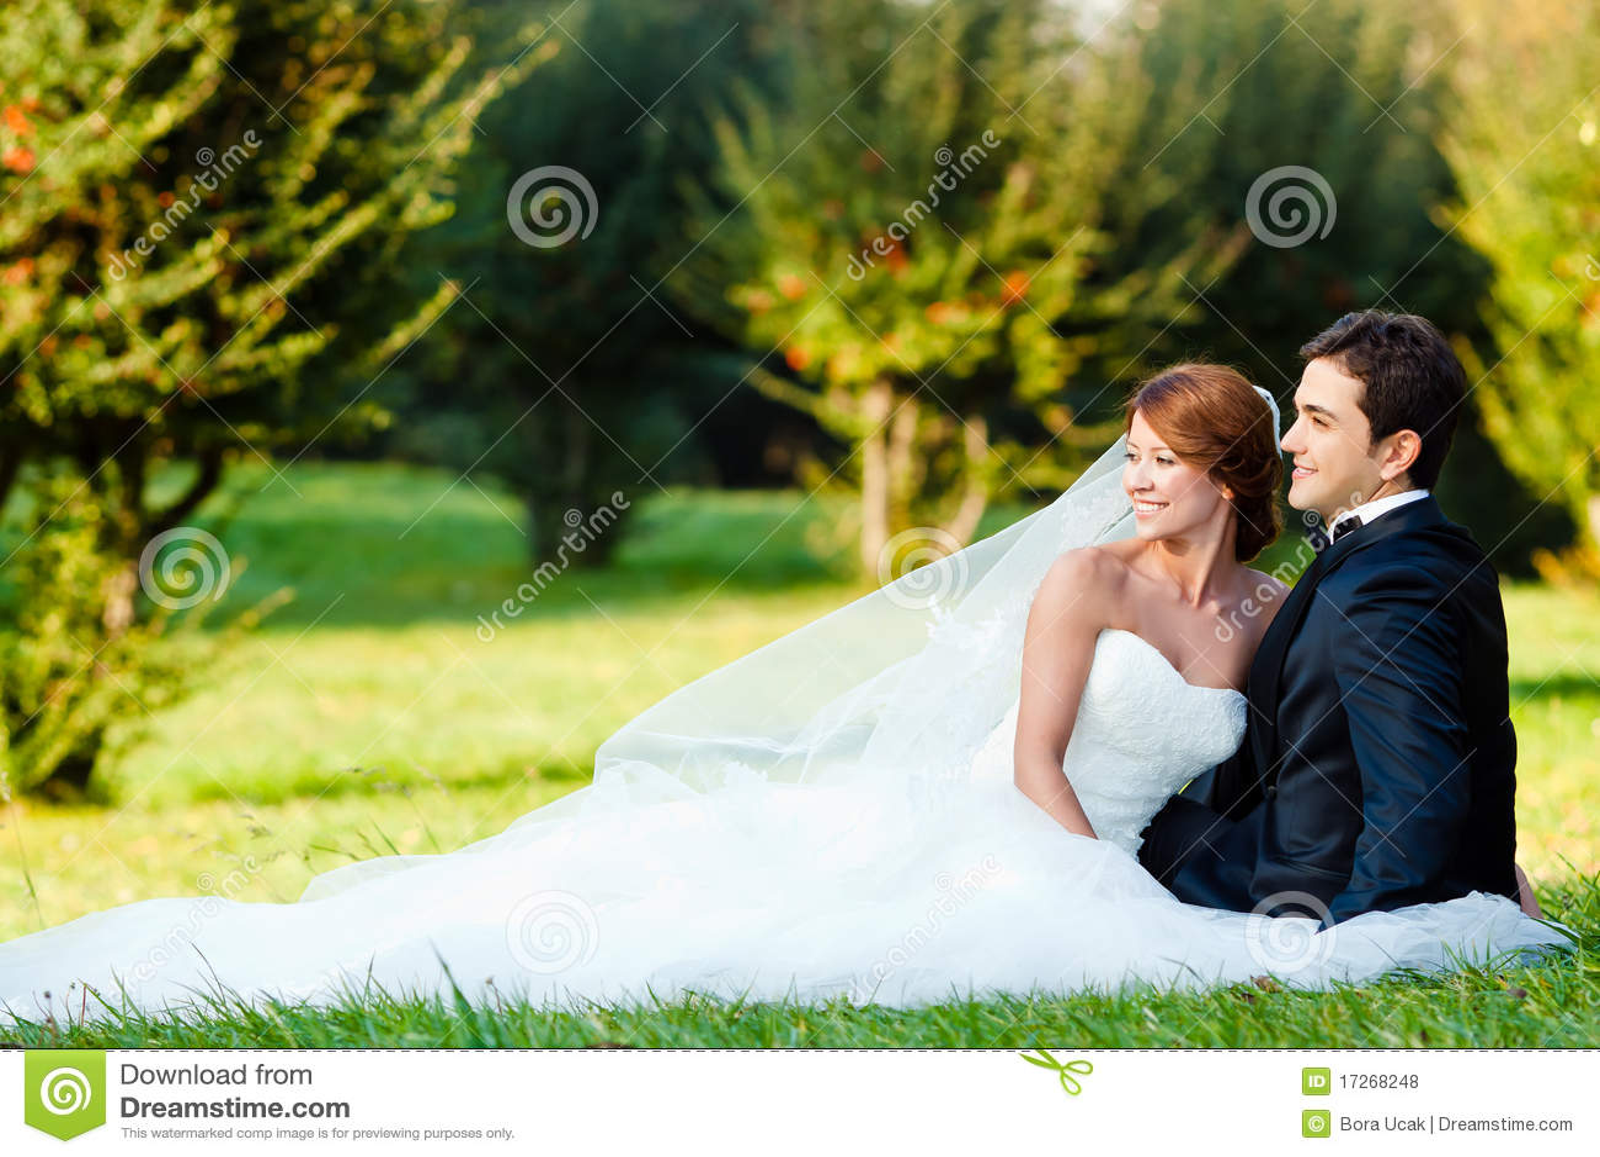 Wedding - Wikipedia